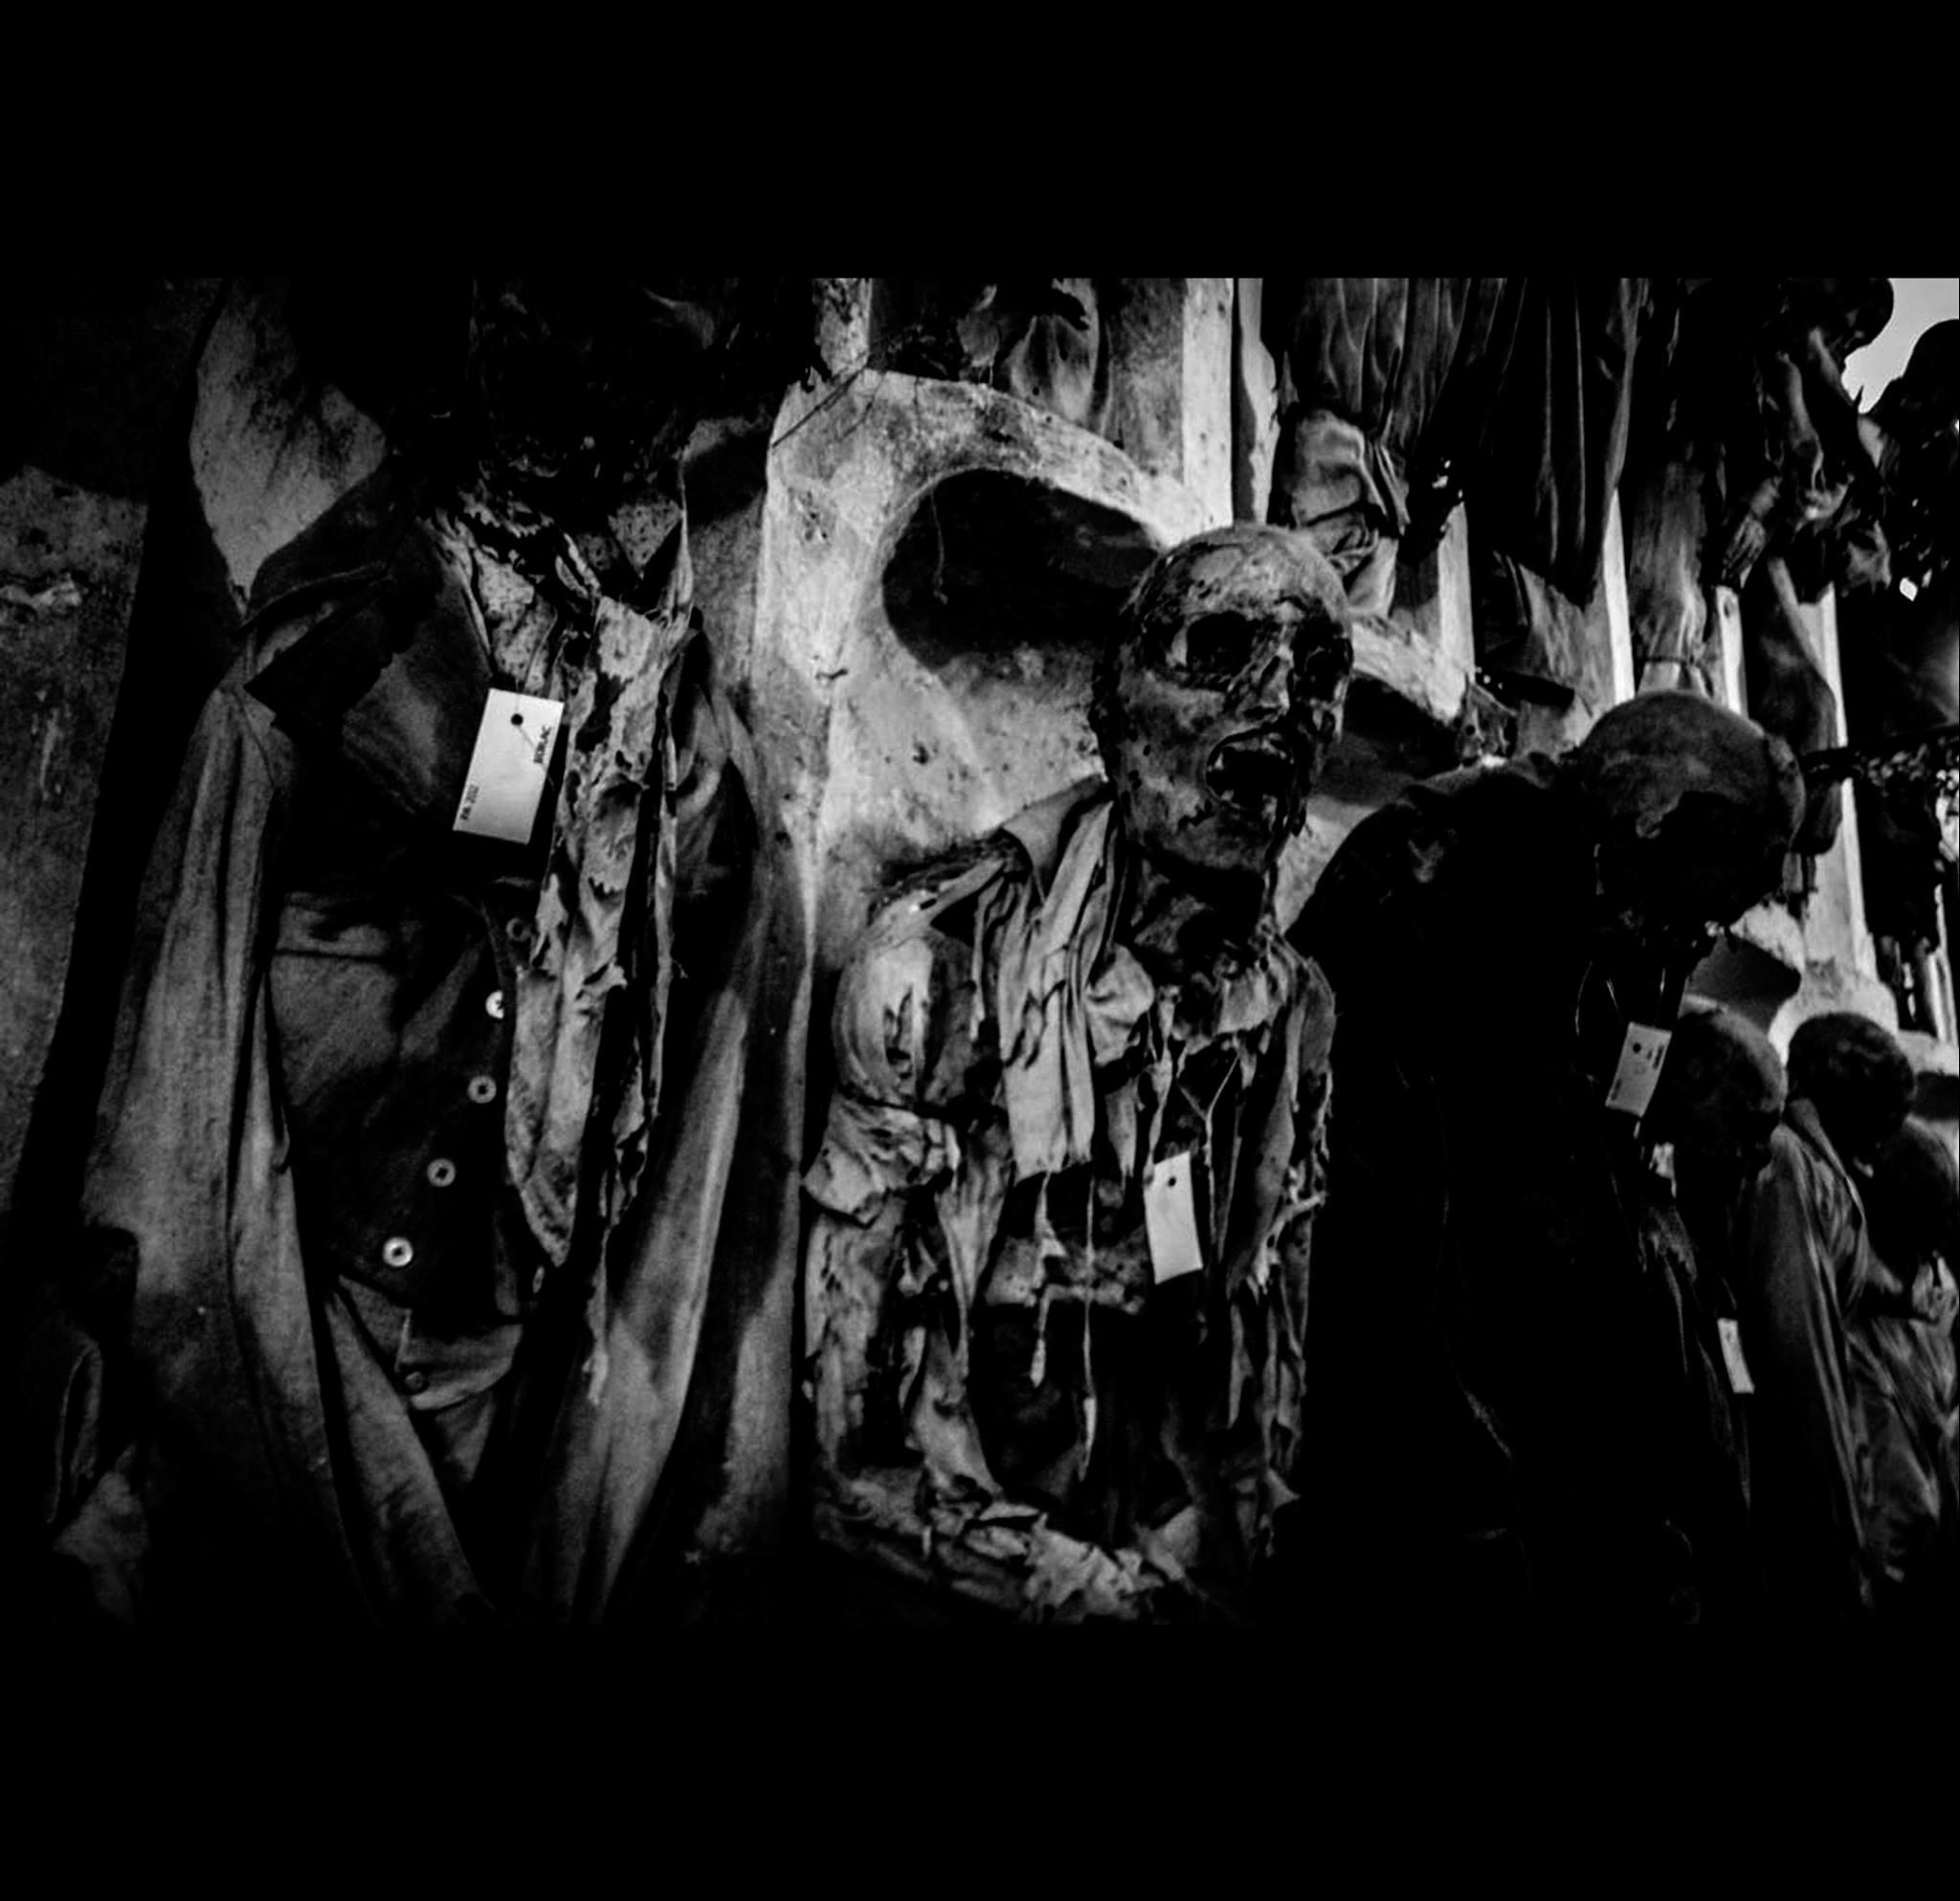 RITUAL DEATH - AOSOTH